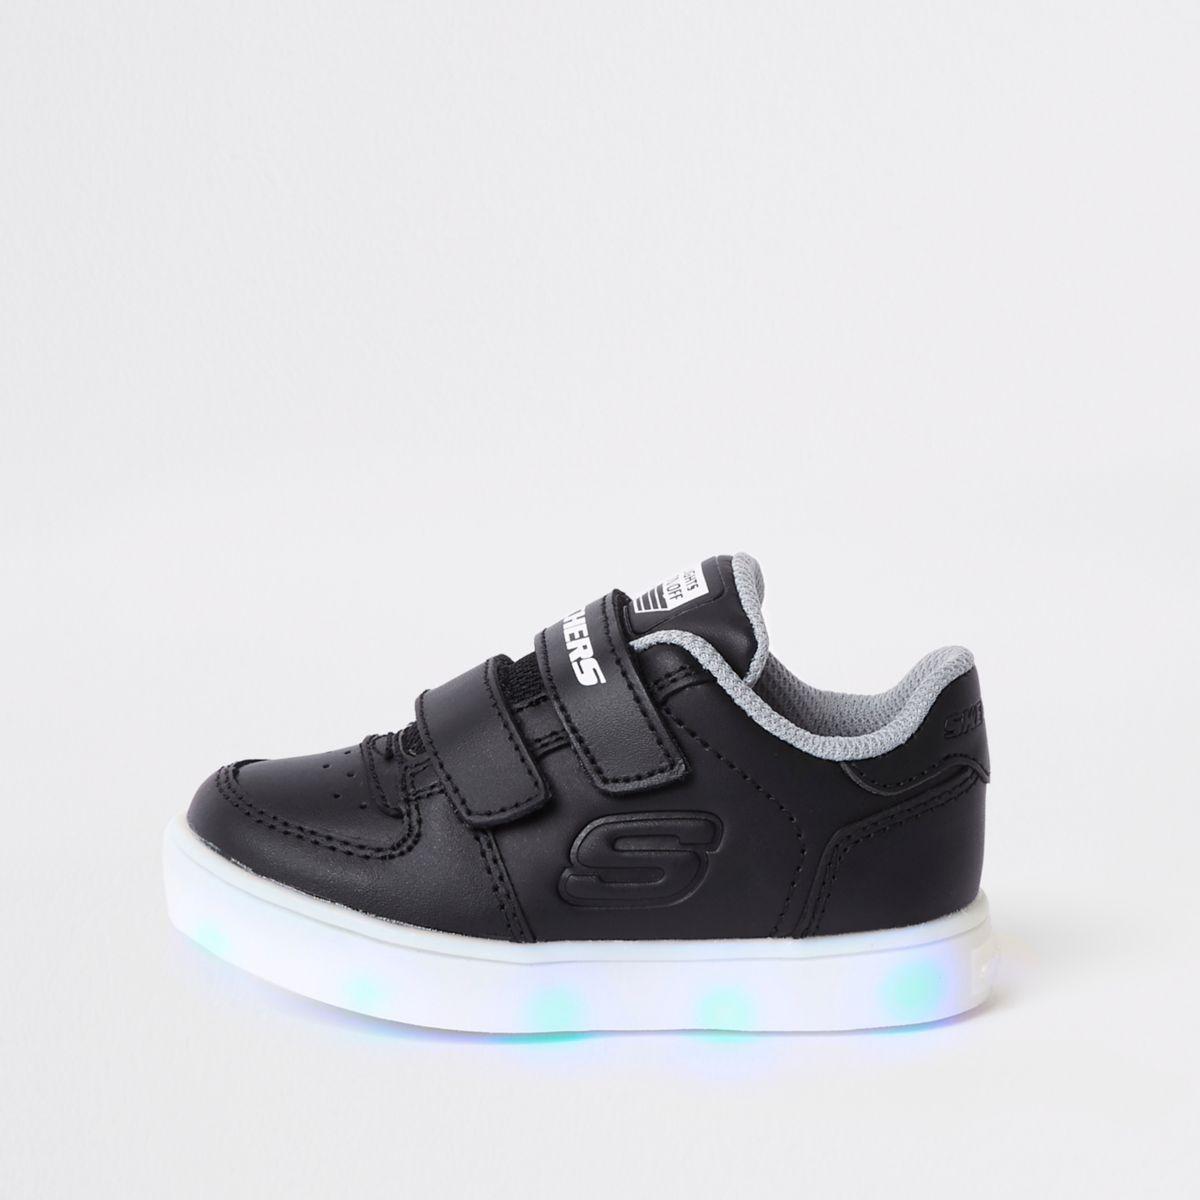 Baskets Skechers noires lumineuses mini garçon